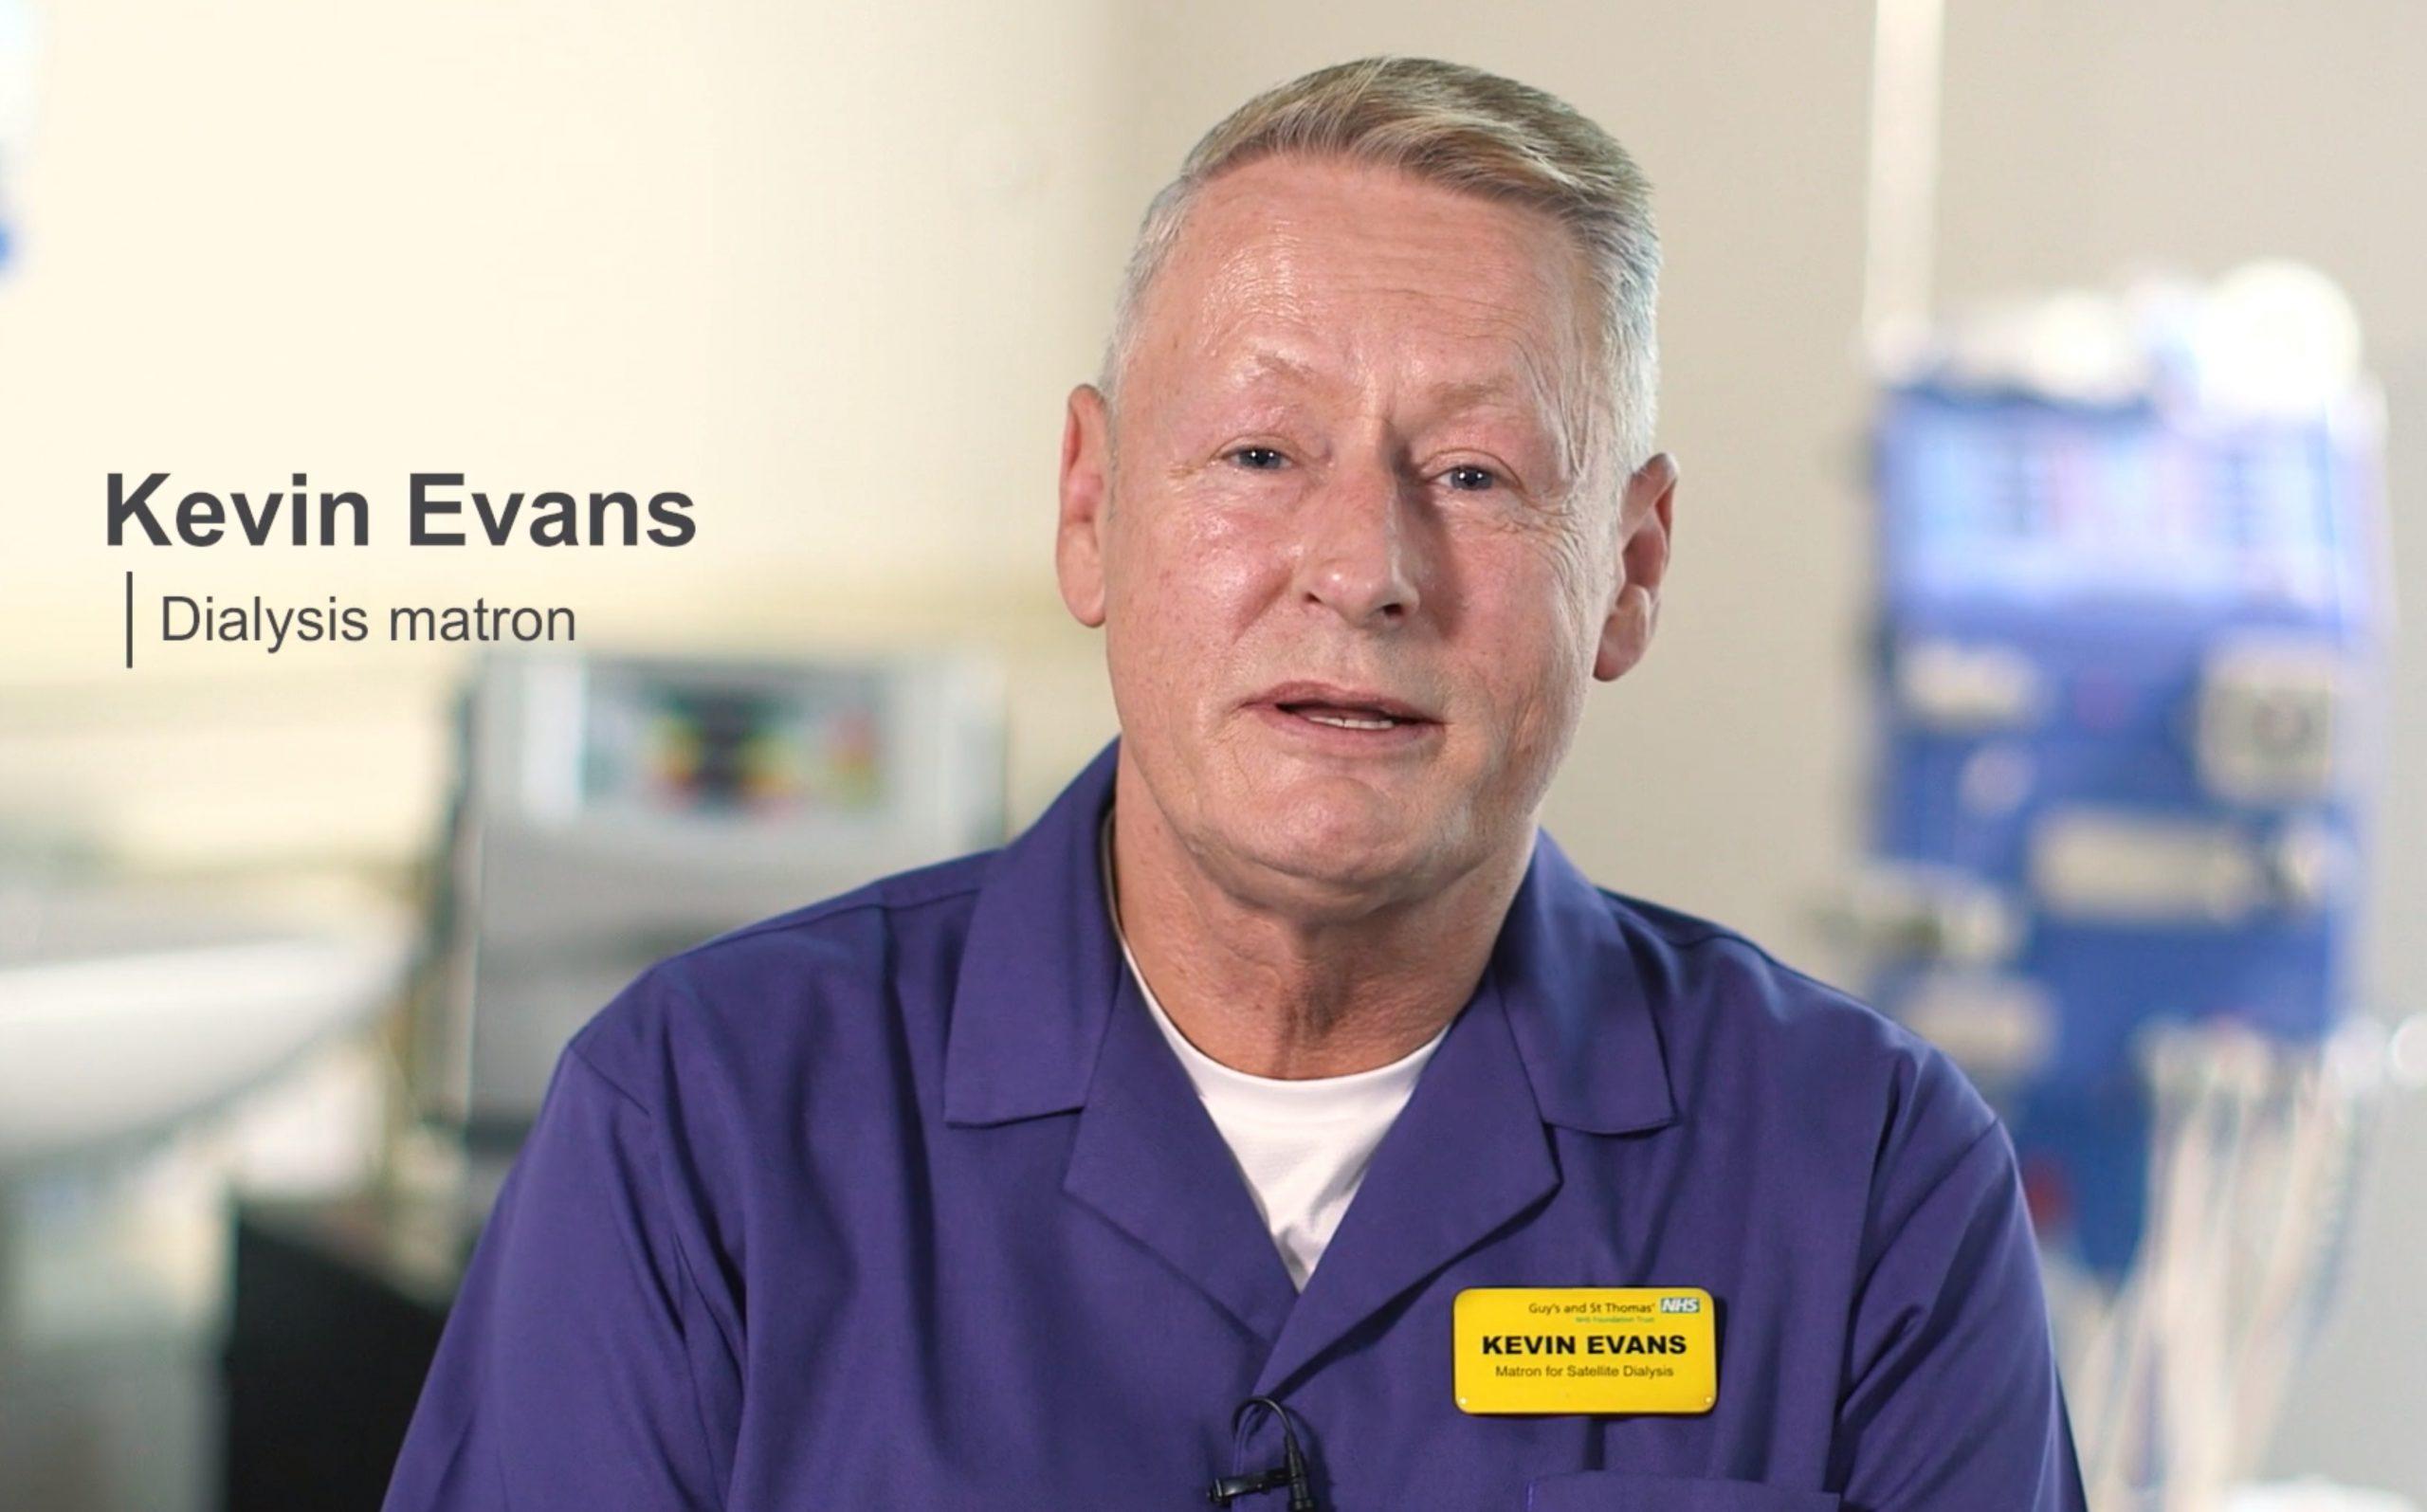 patient information video guys & thomas hospital | magneto films | London